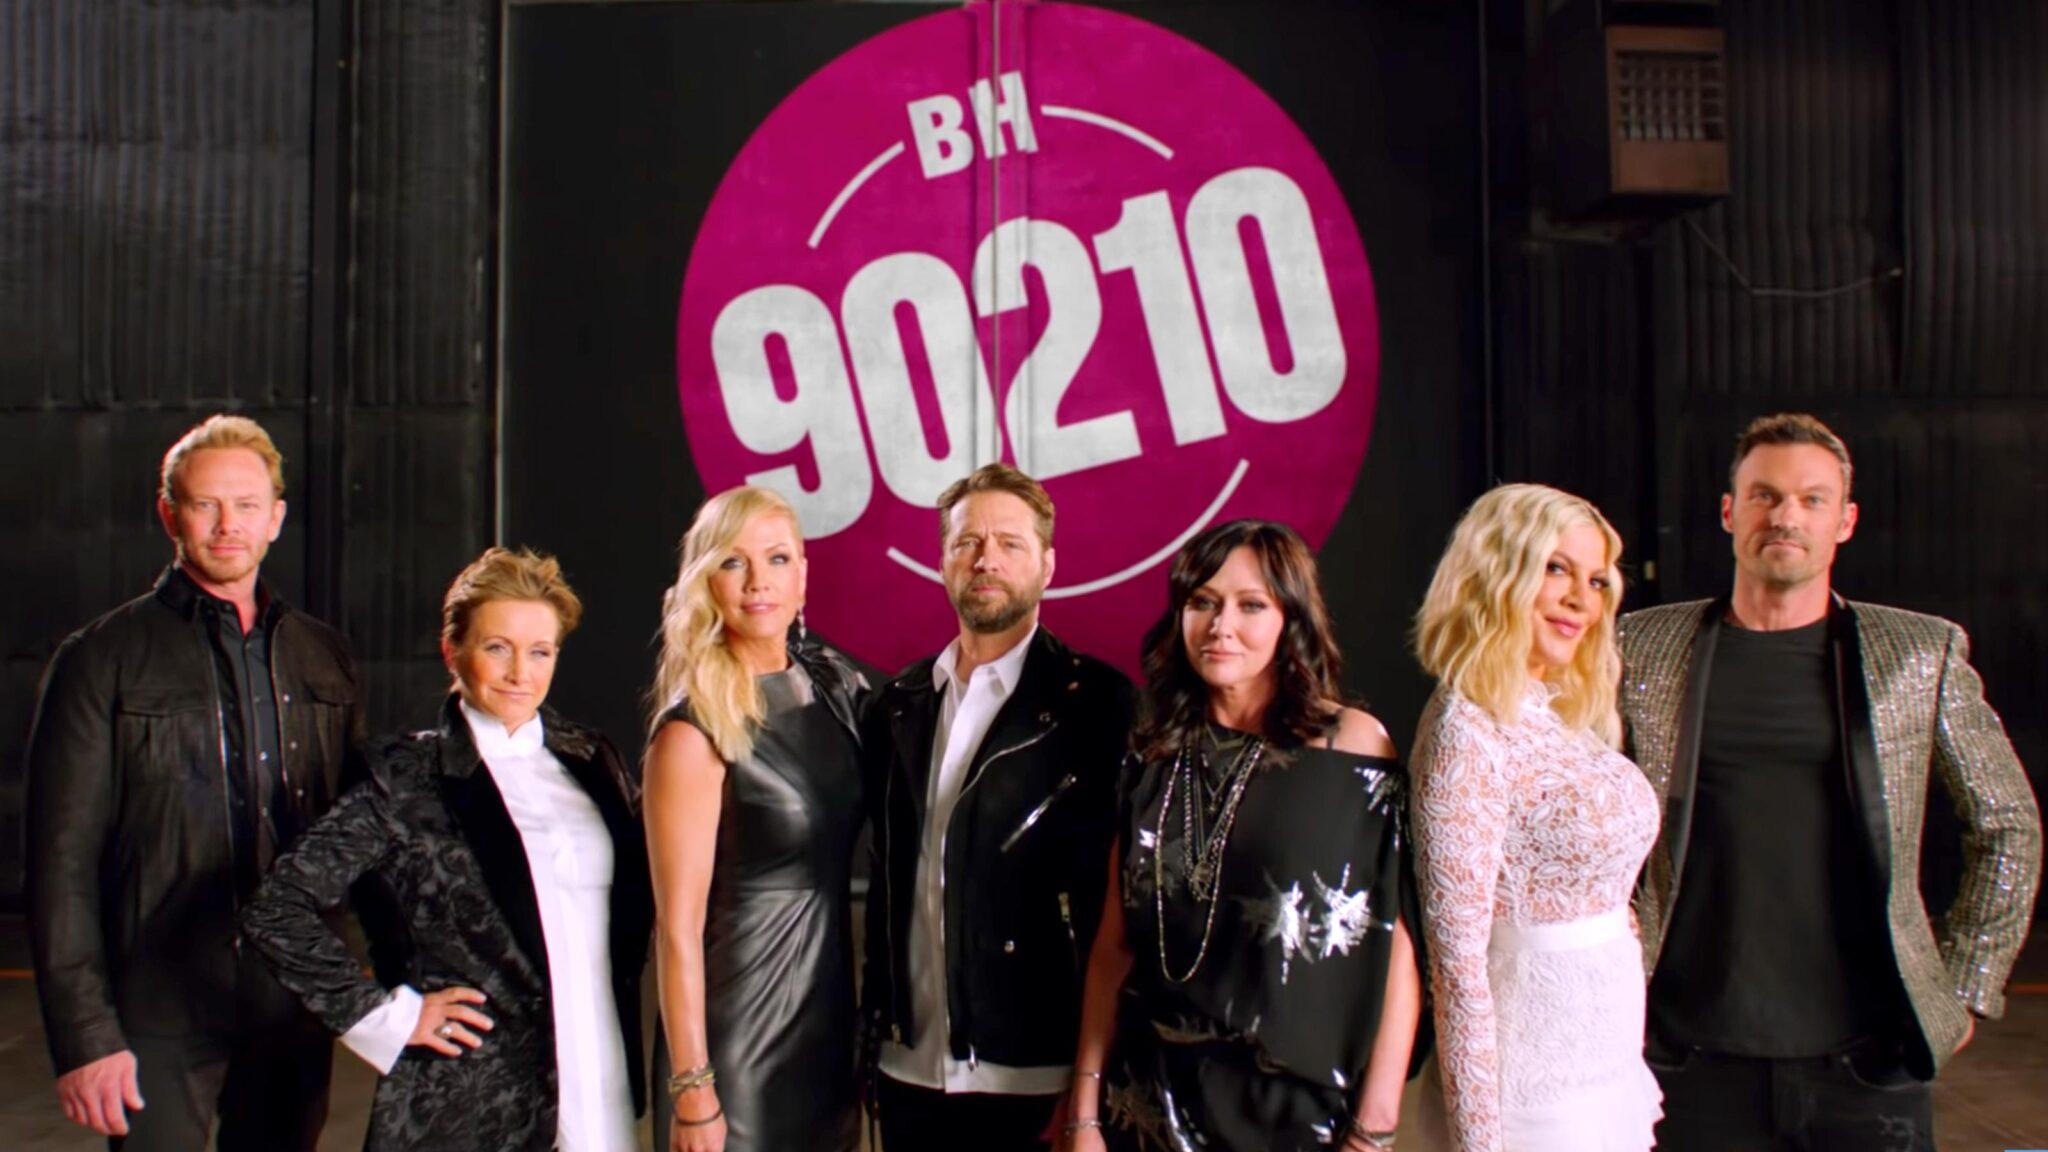 Beverly Hills 90210 trailer Reboot